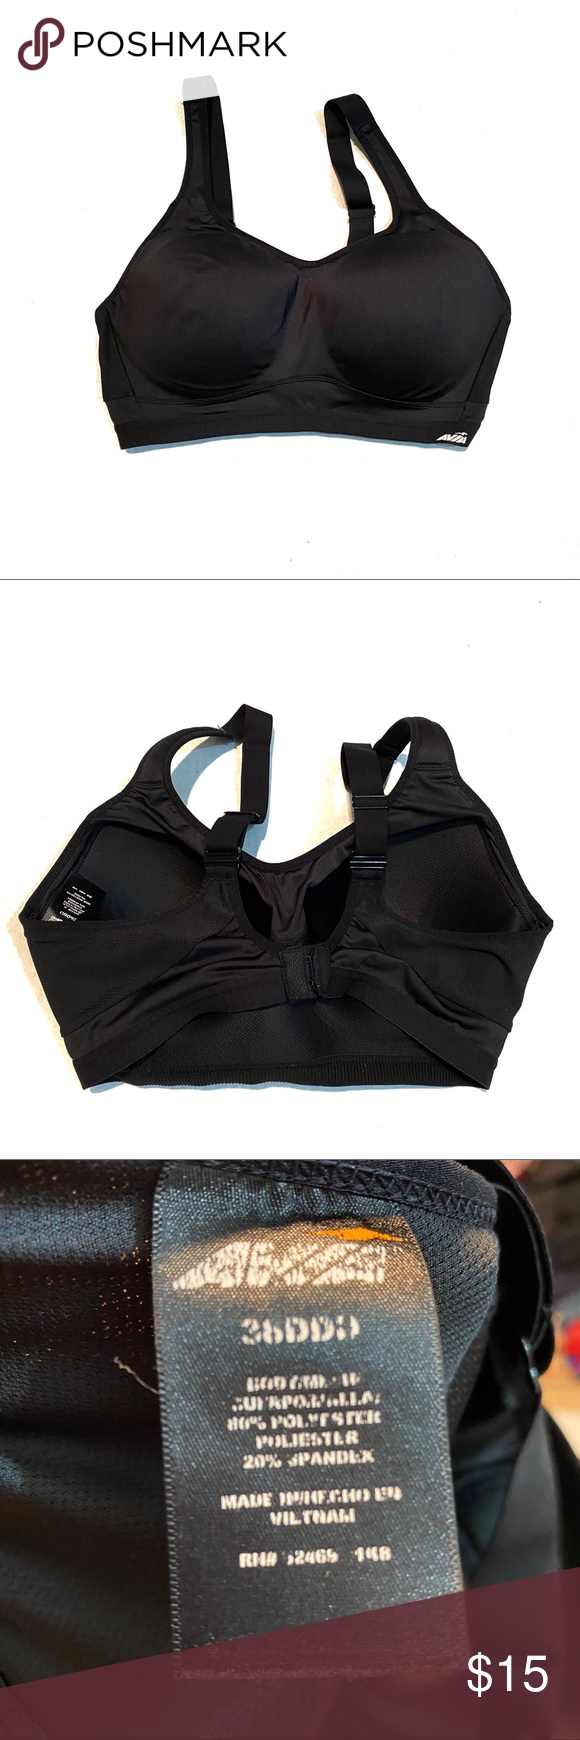 Avia Sports Bra Size 38DDD Black in 2020 Sports bra